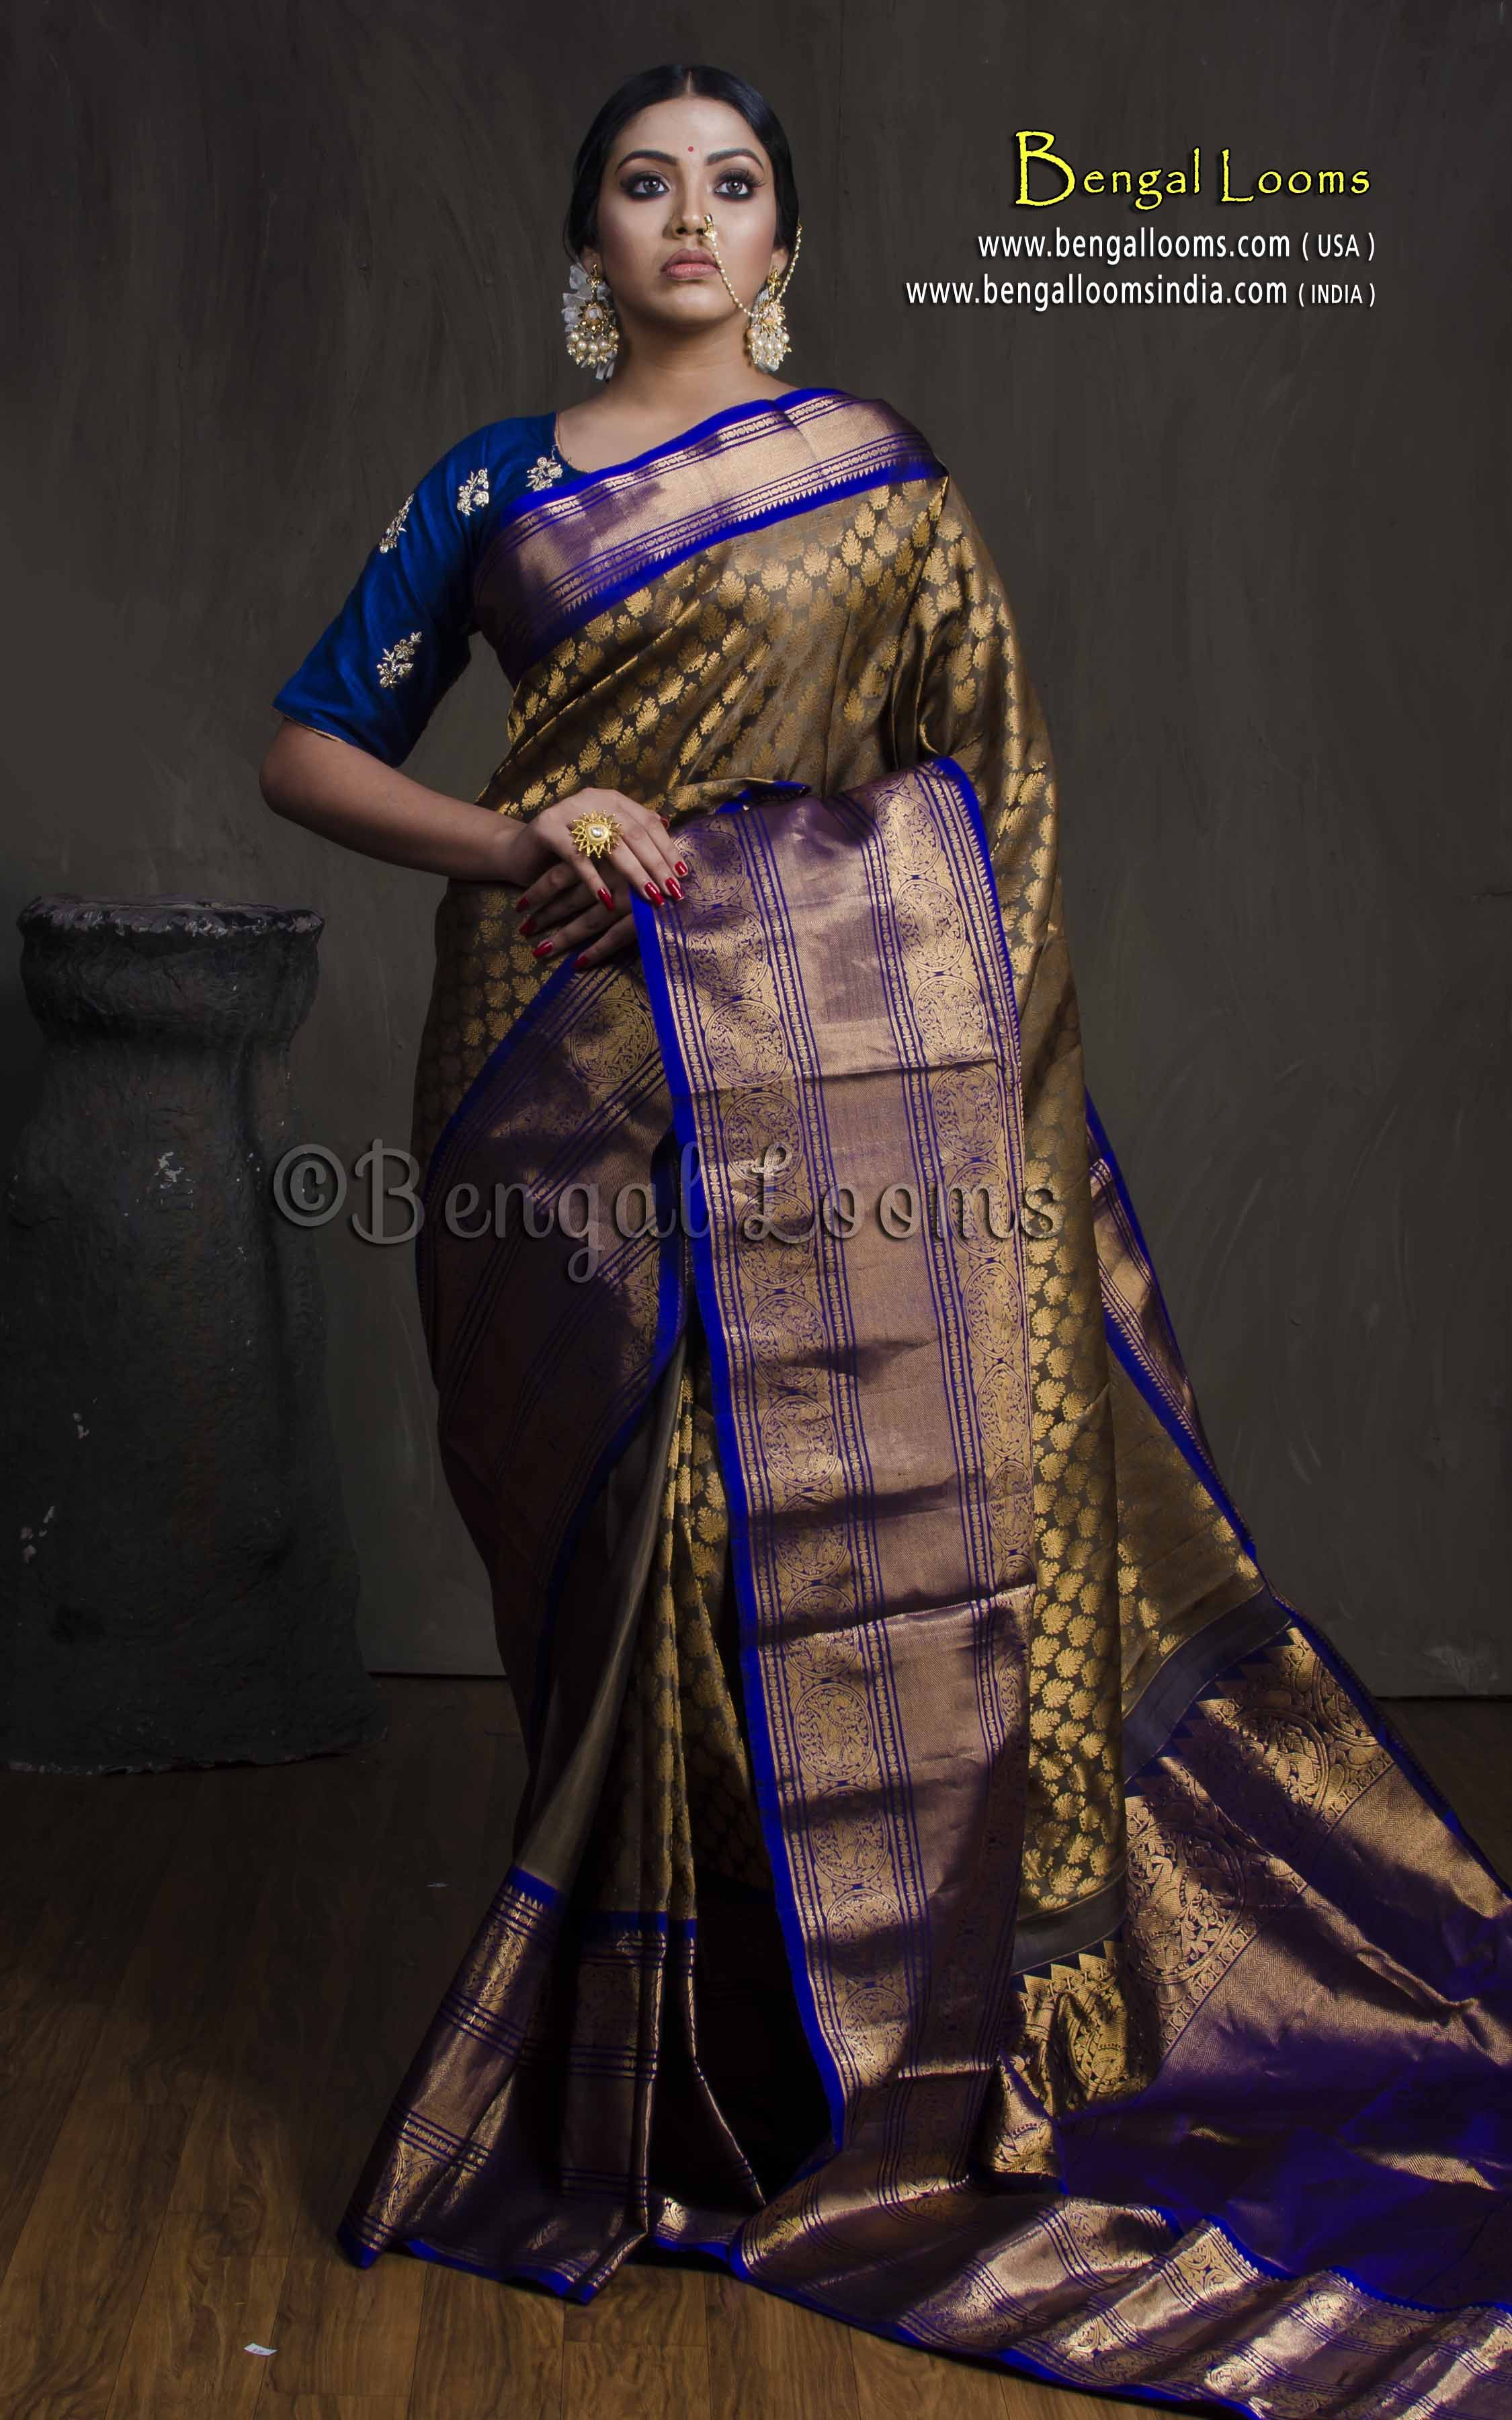 94778809543e3 Premium Quality Brocade Kanjivaram Saree in Metallic Brown and Dark Blue